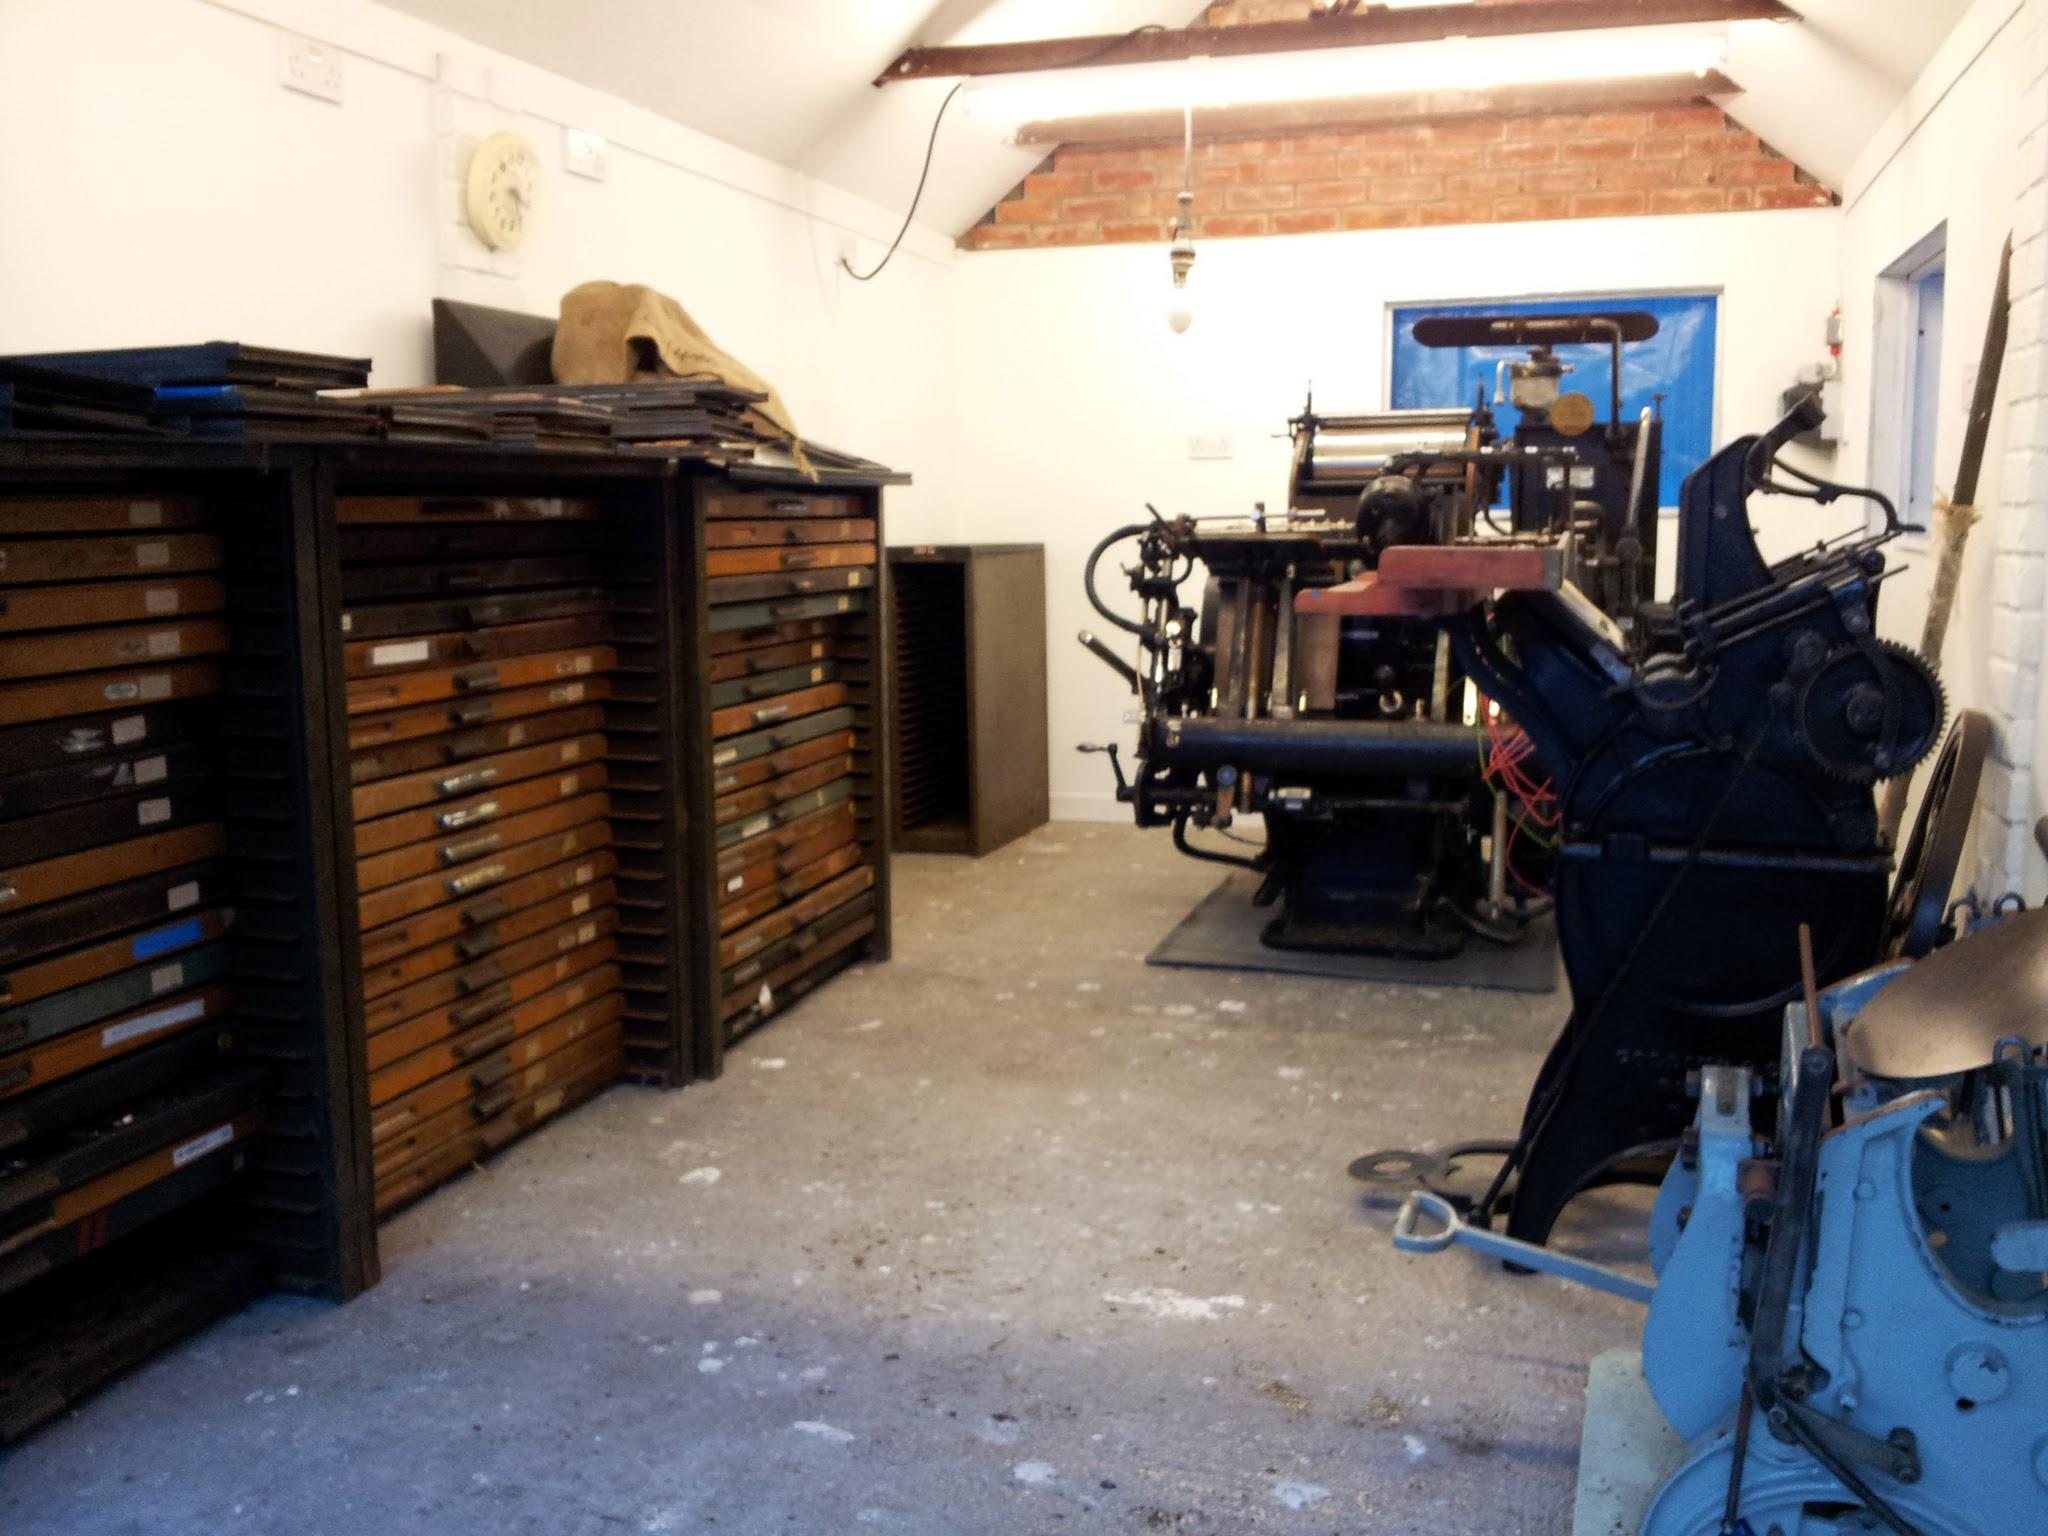 Letterpress Studio with Golding Pearl No 3 Treadle Press and Heidelberg Windmill 10x15